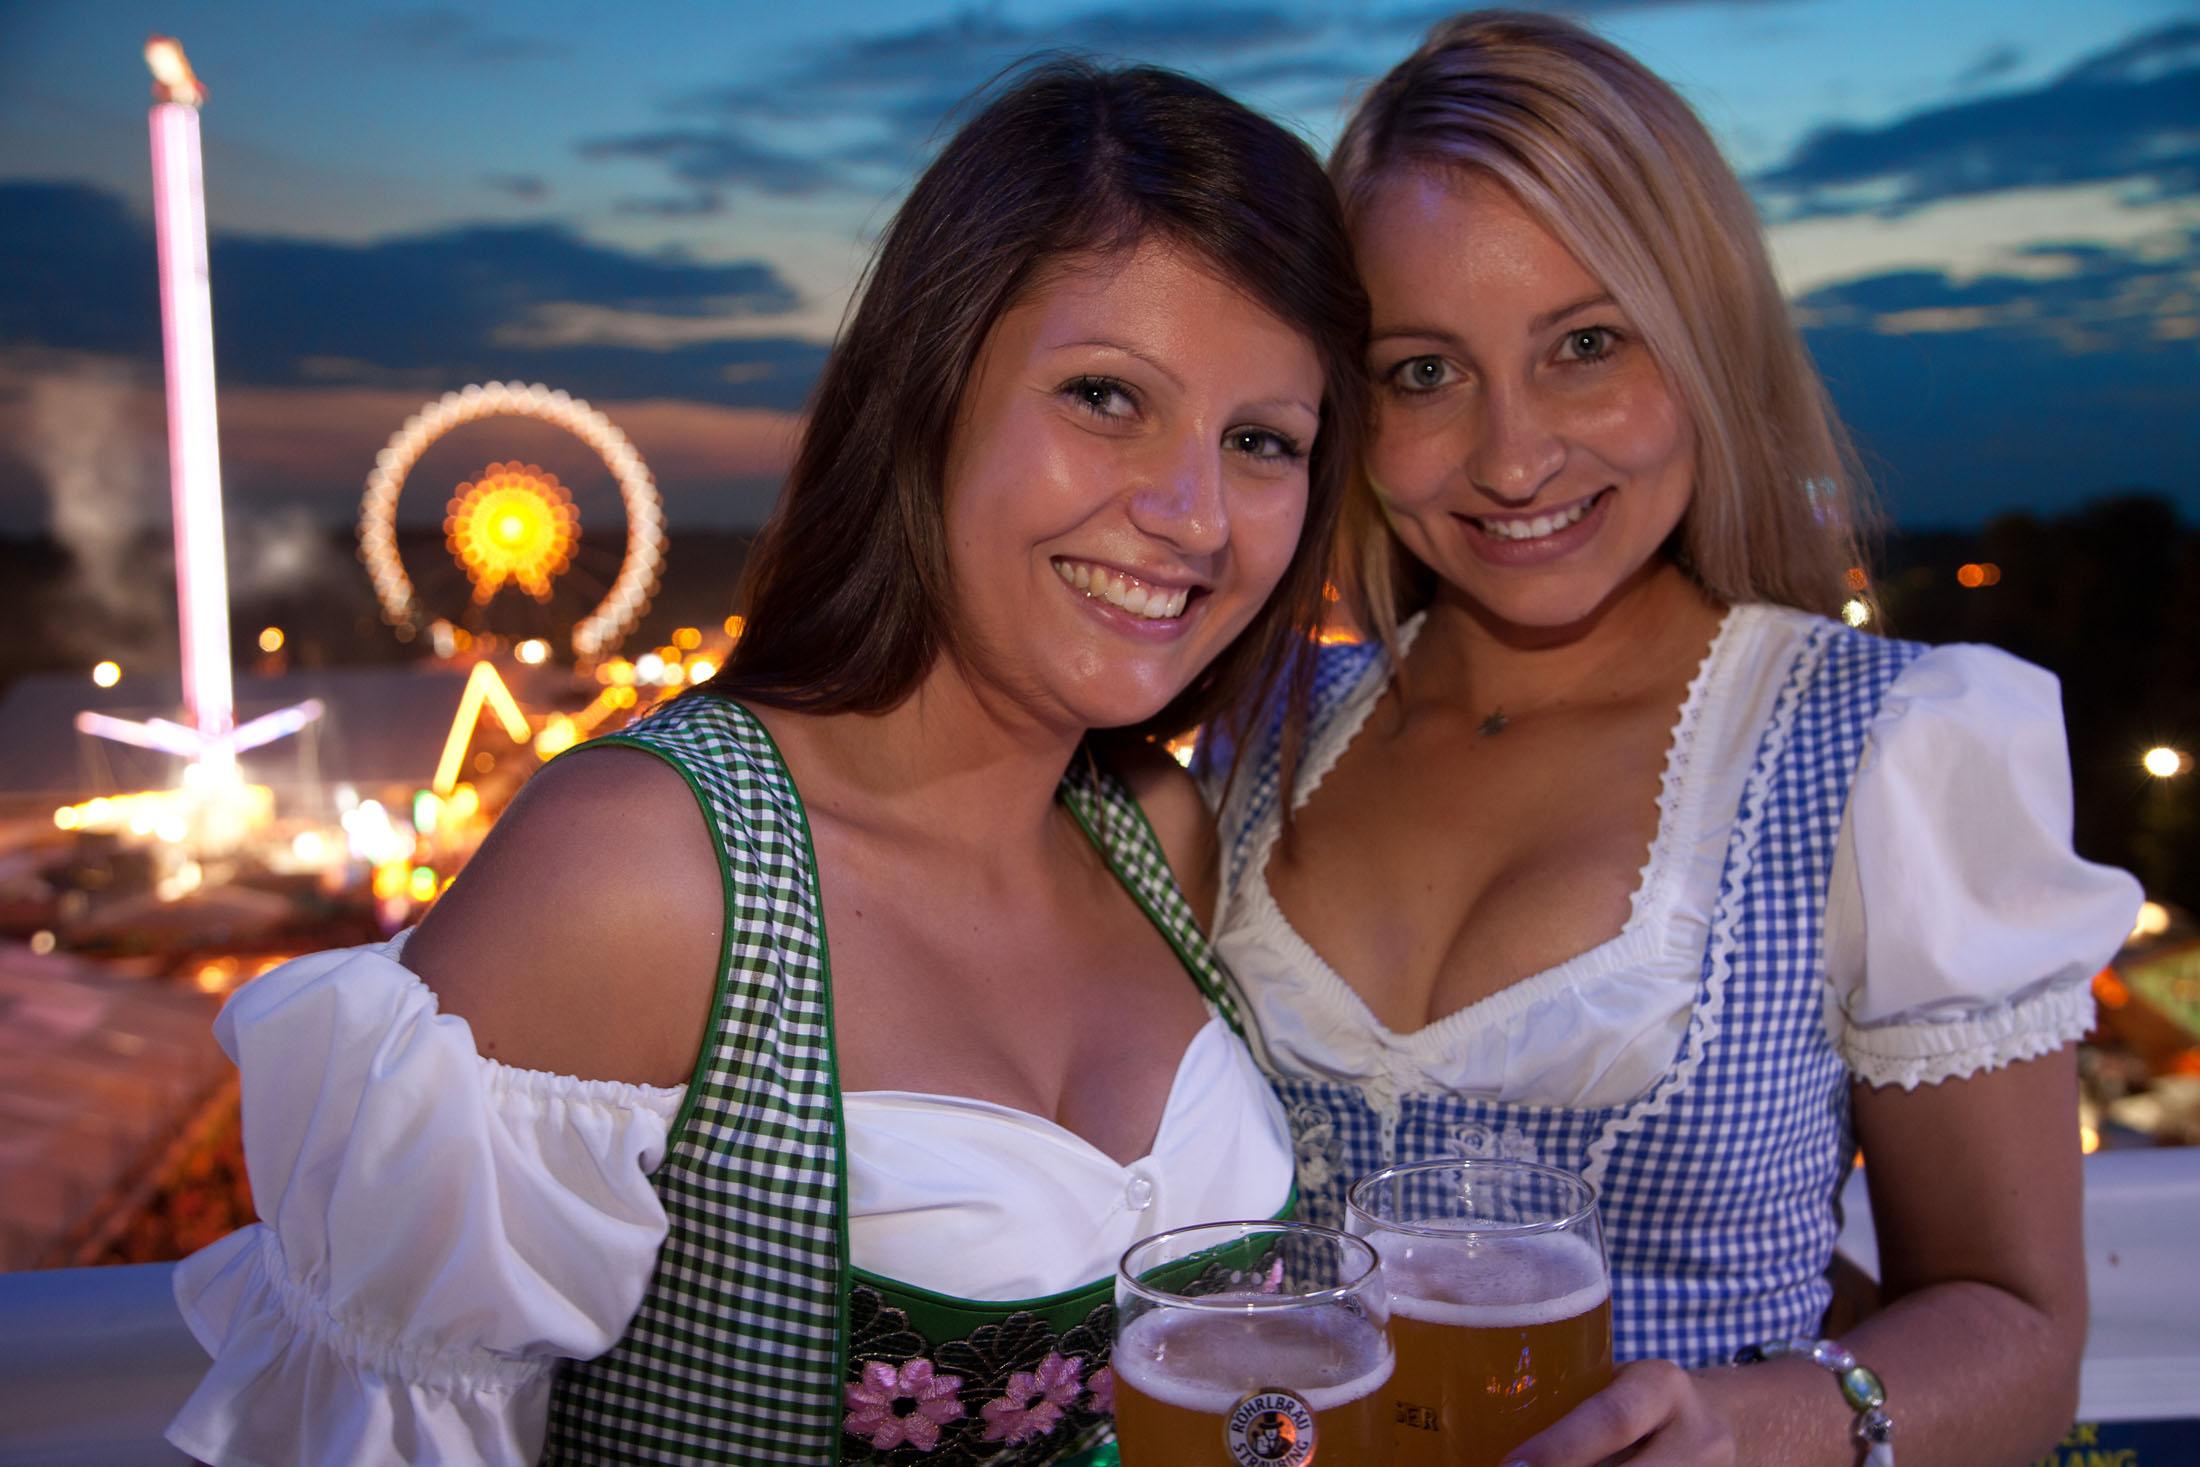 At the second largest public festival in Bavaria - Straubinger Gäubodenfest